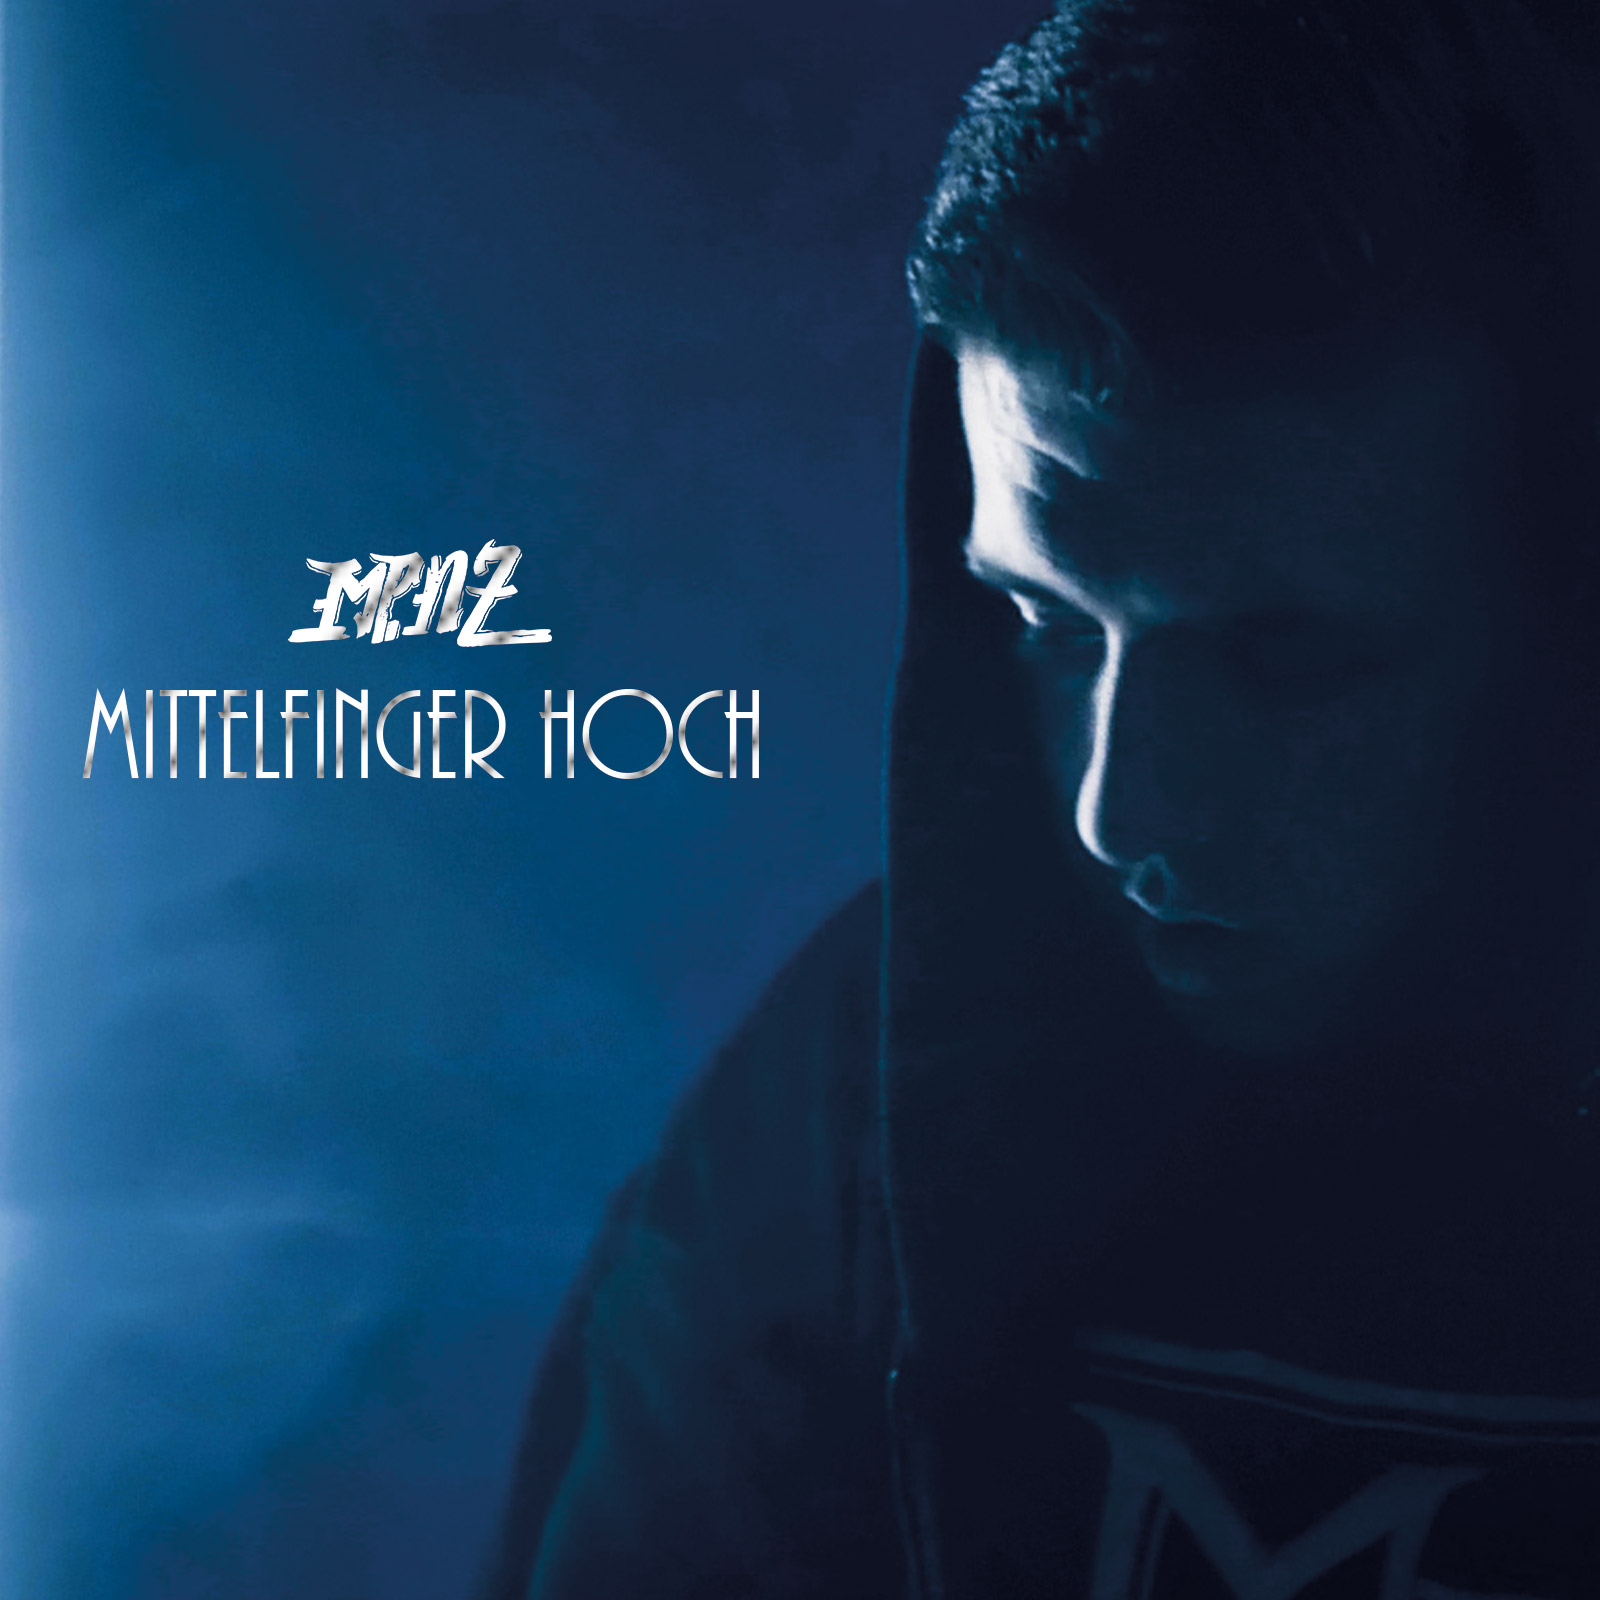 Upcoming: MPnZ - Mittelfinger Hoch